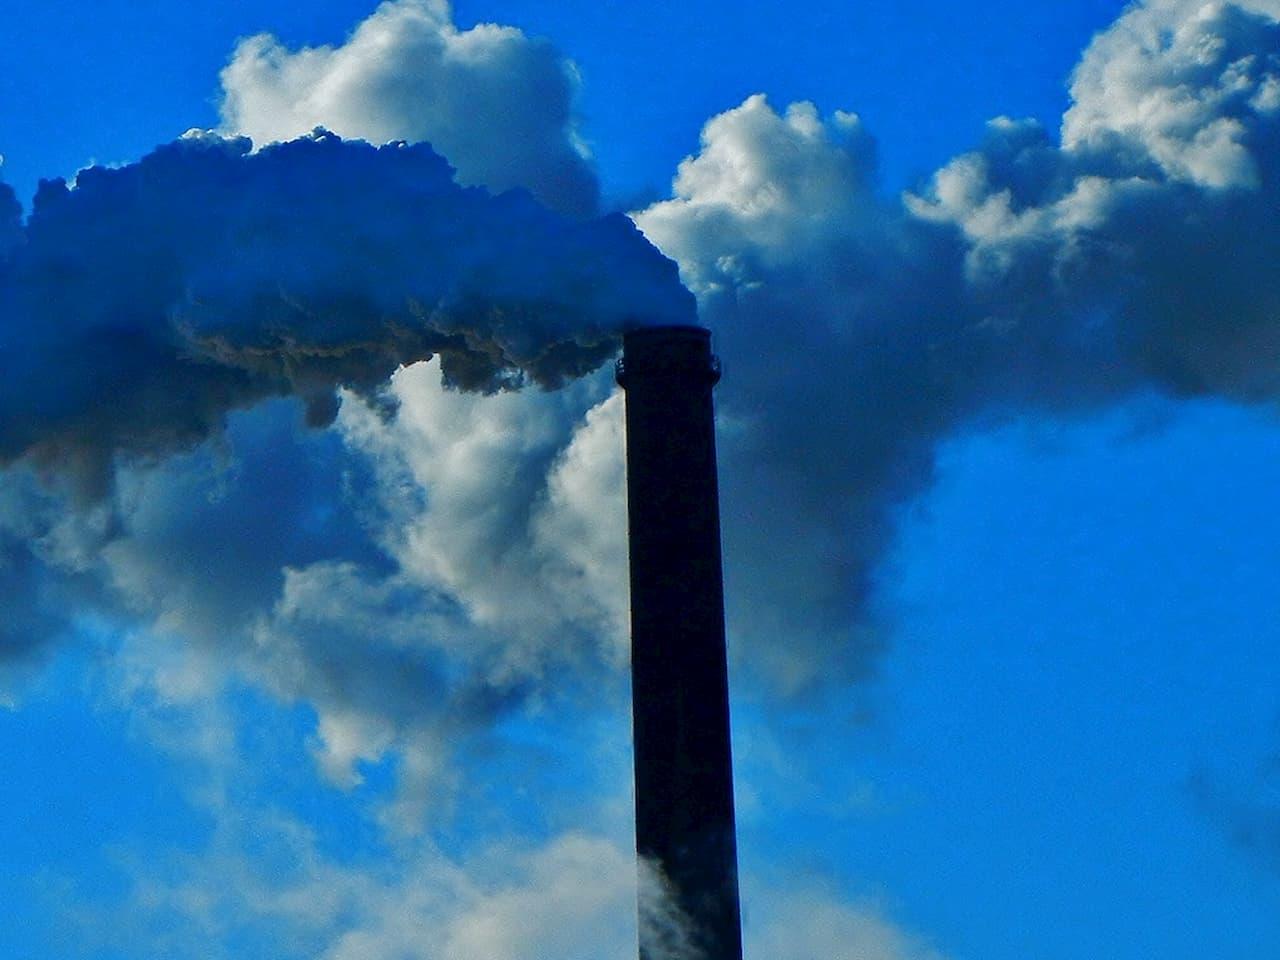 Emissioni nessuno vuol prendersi la responsabilità